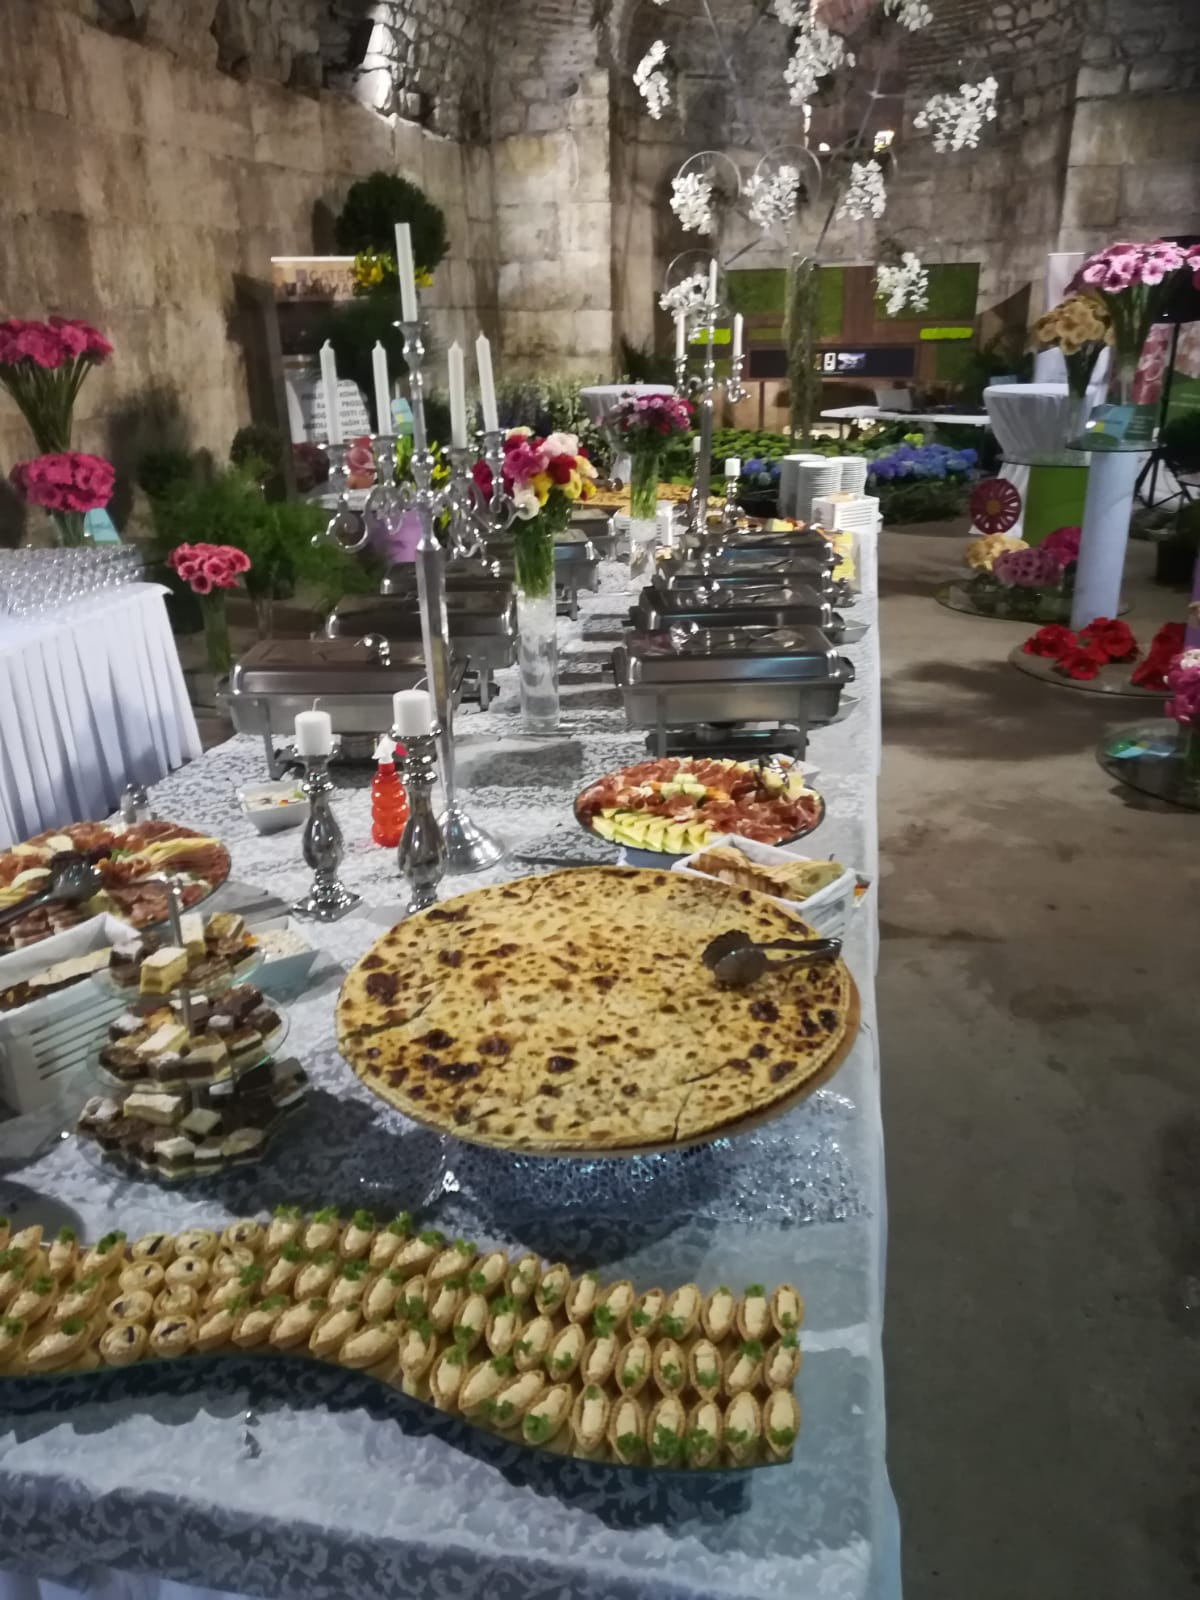 Dioklecijanovi podrumi catering